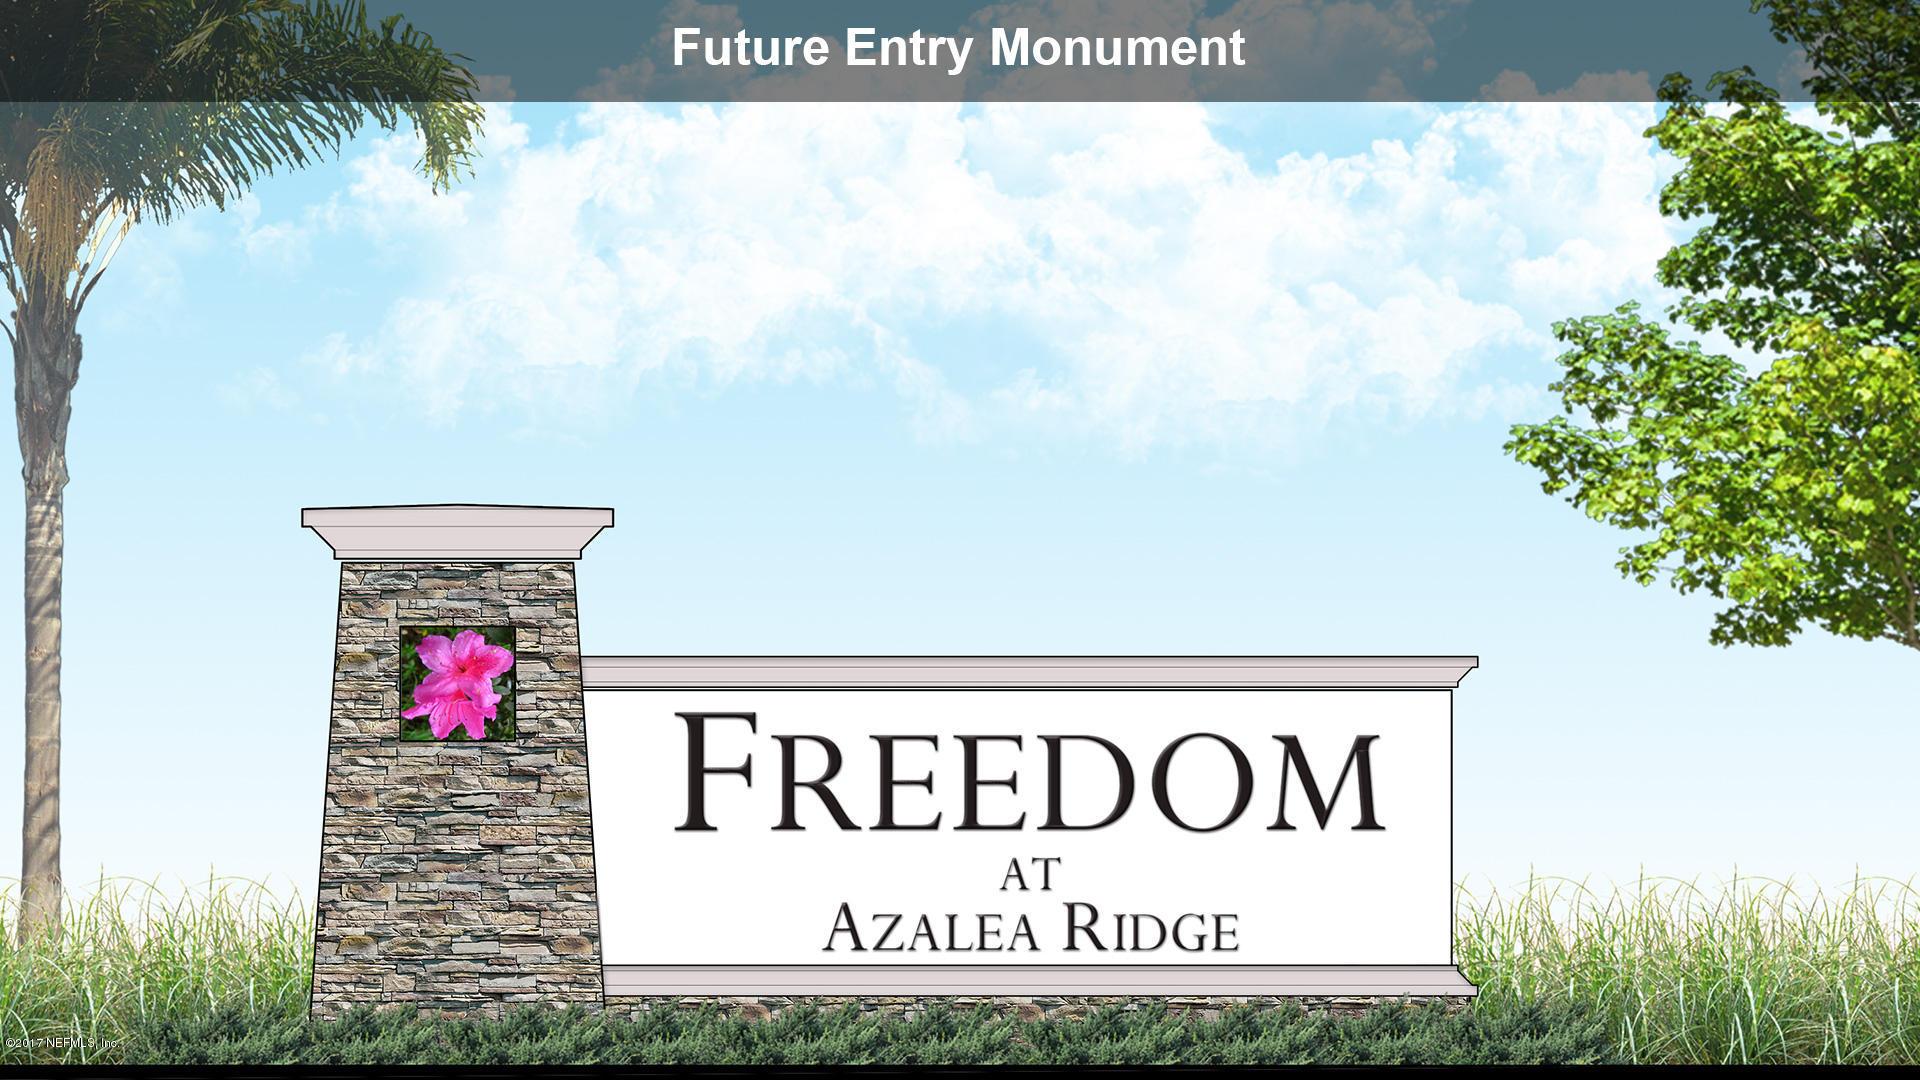 4042 SPRING CREEK, MIDDLEBURG, FLORIDA 32068, 3 Bedrooms Bedrooms, ,2 BathroomsBathrooms,Residential,For sale,SPRING CREEK,1047539